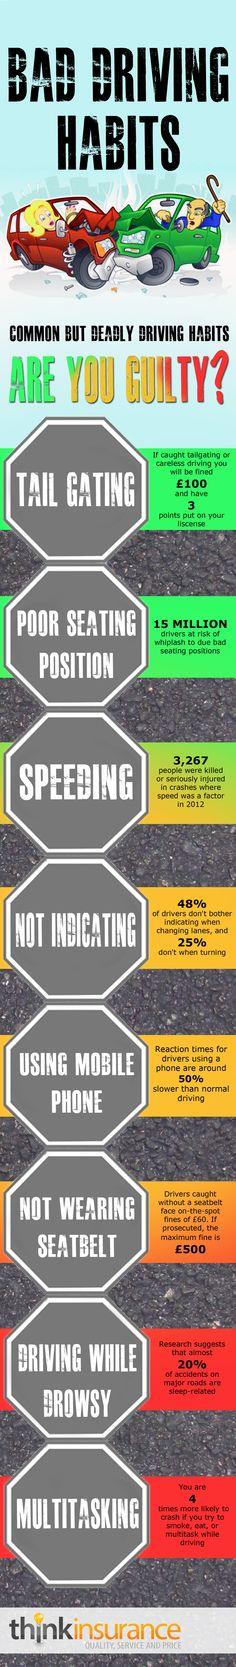 bad driving habits infographic